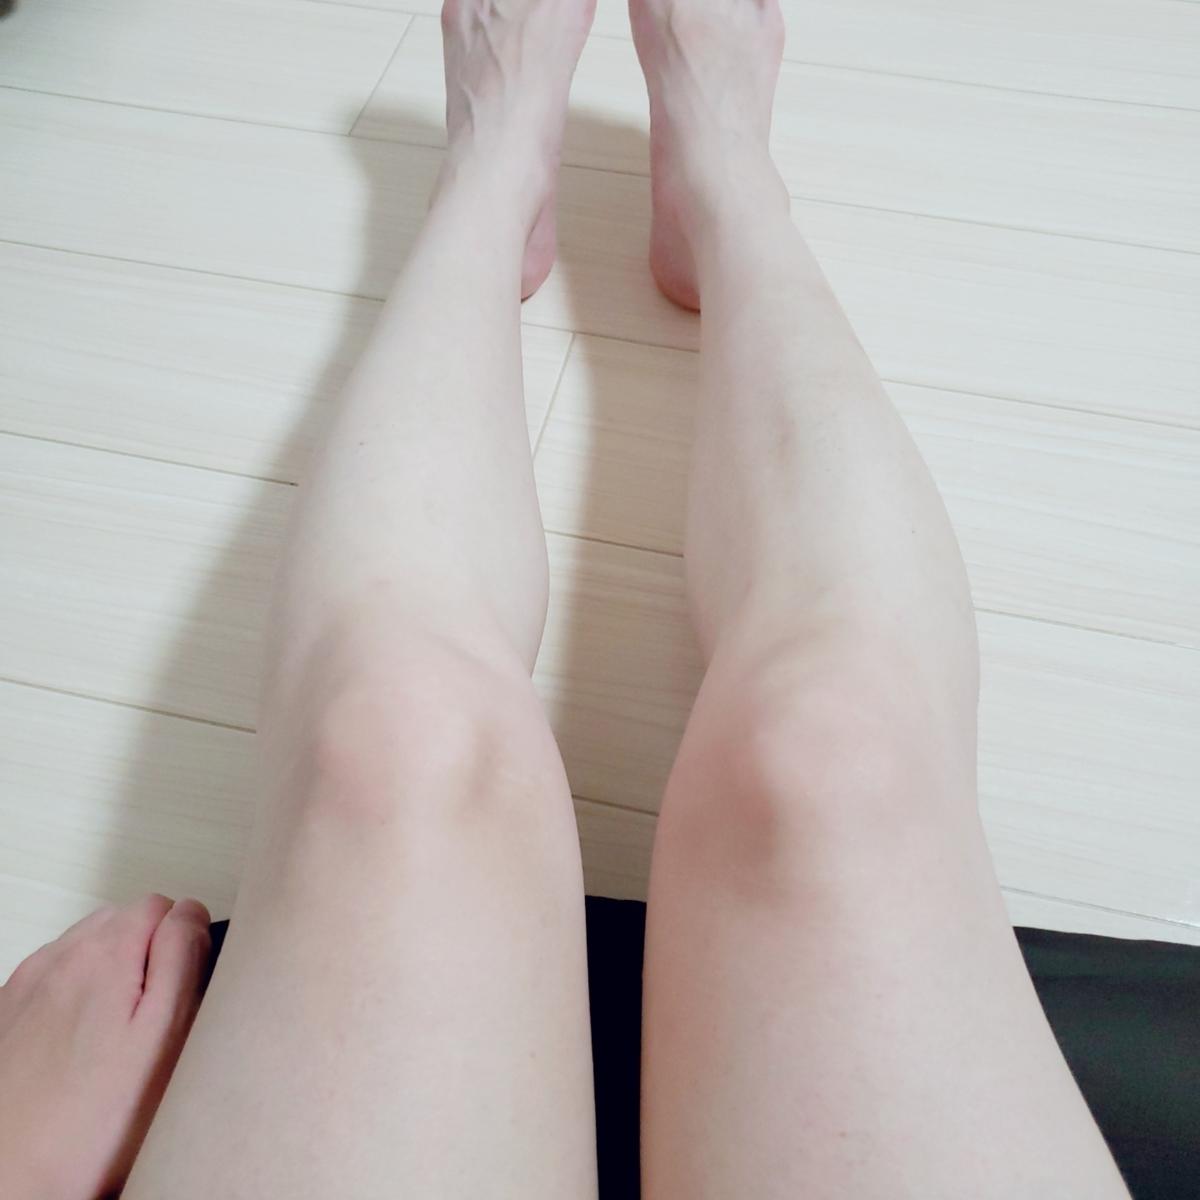 f:id:hihowru:20190630183207j:plain